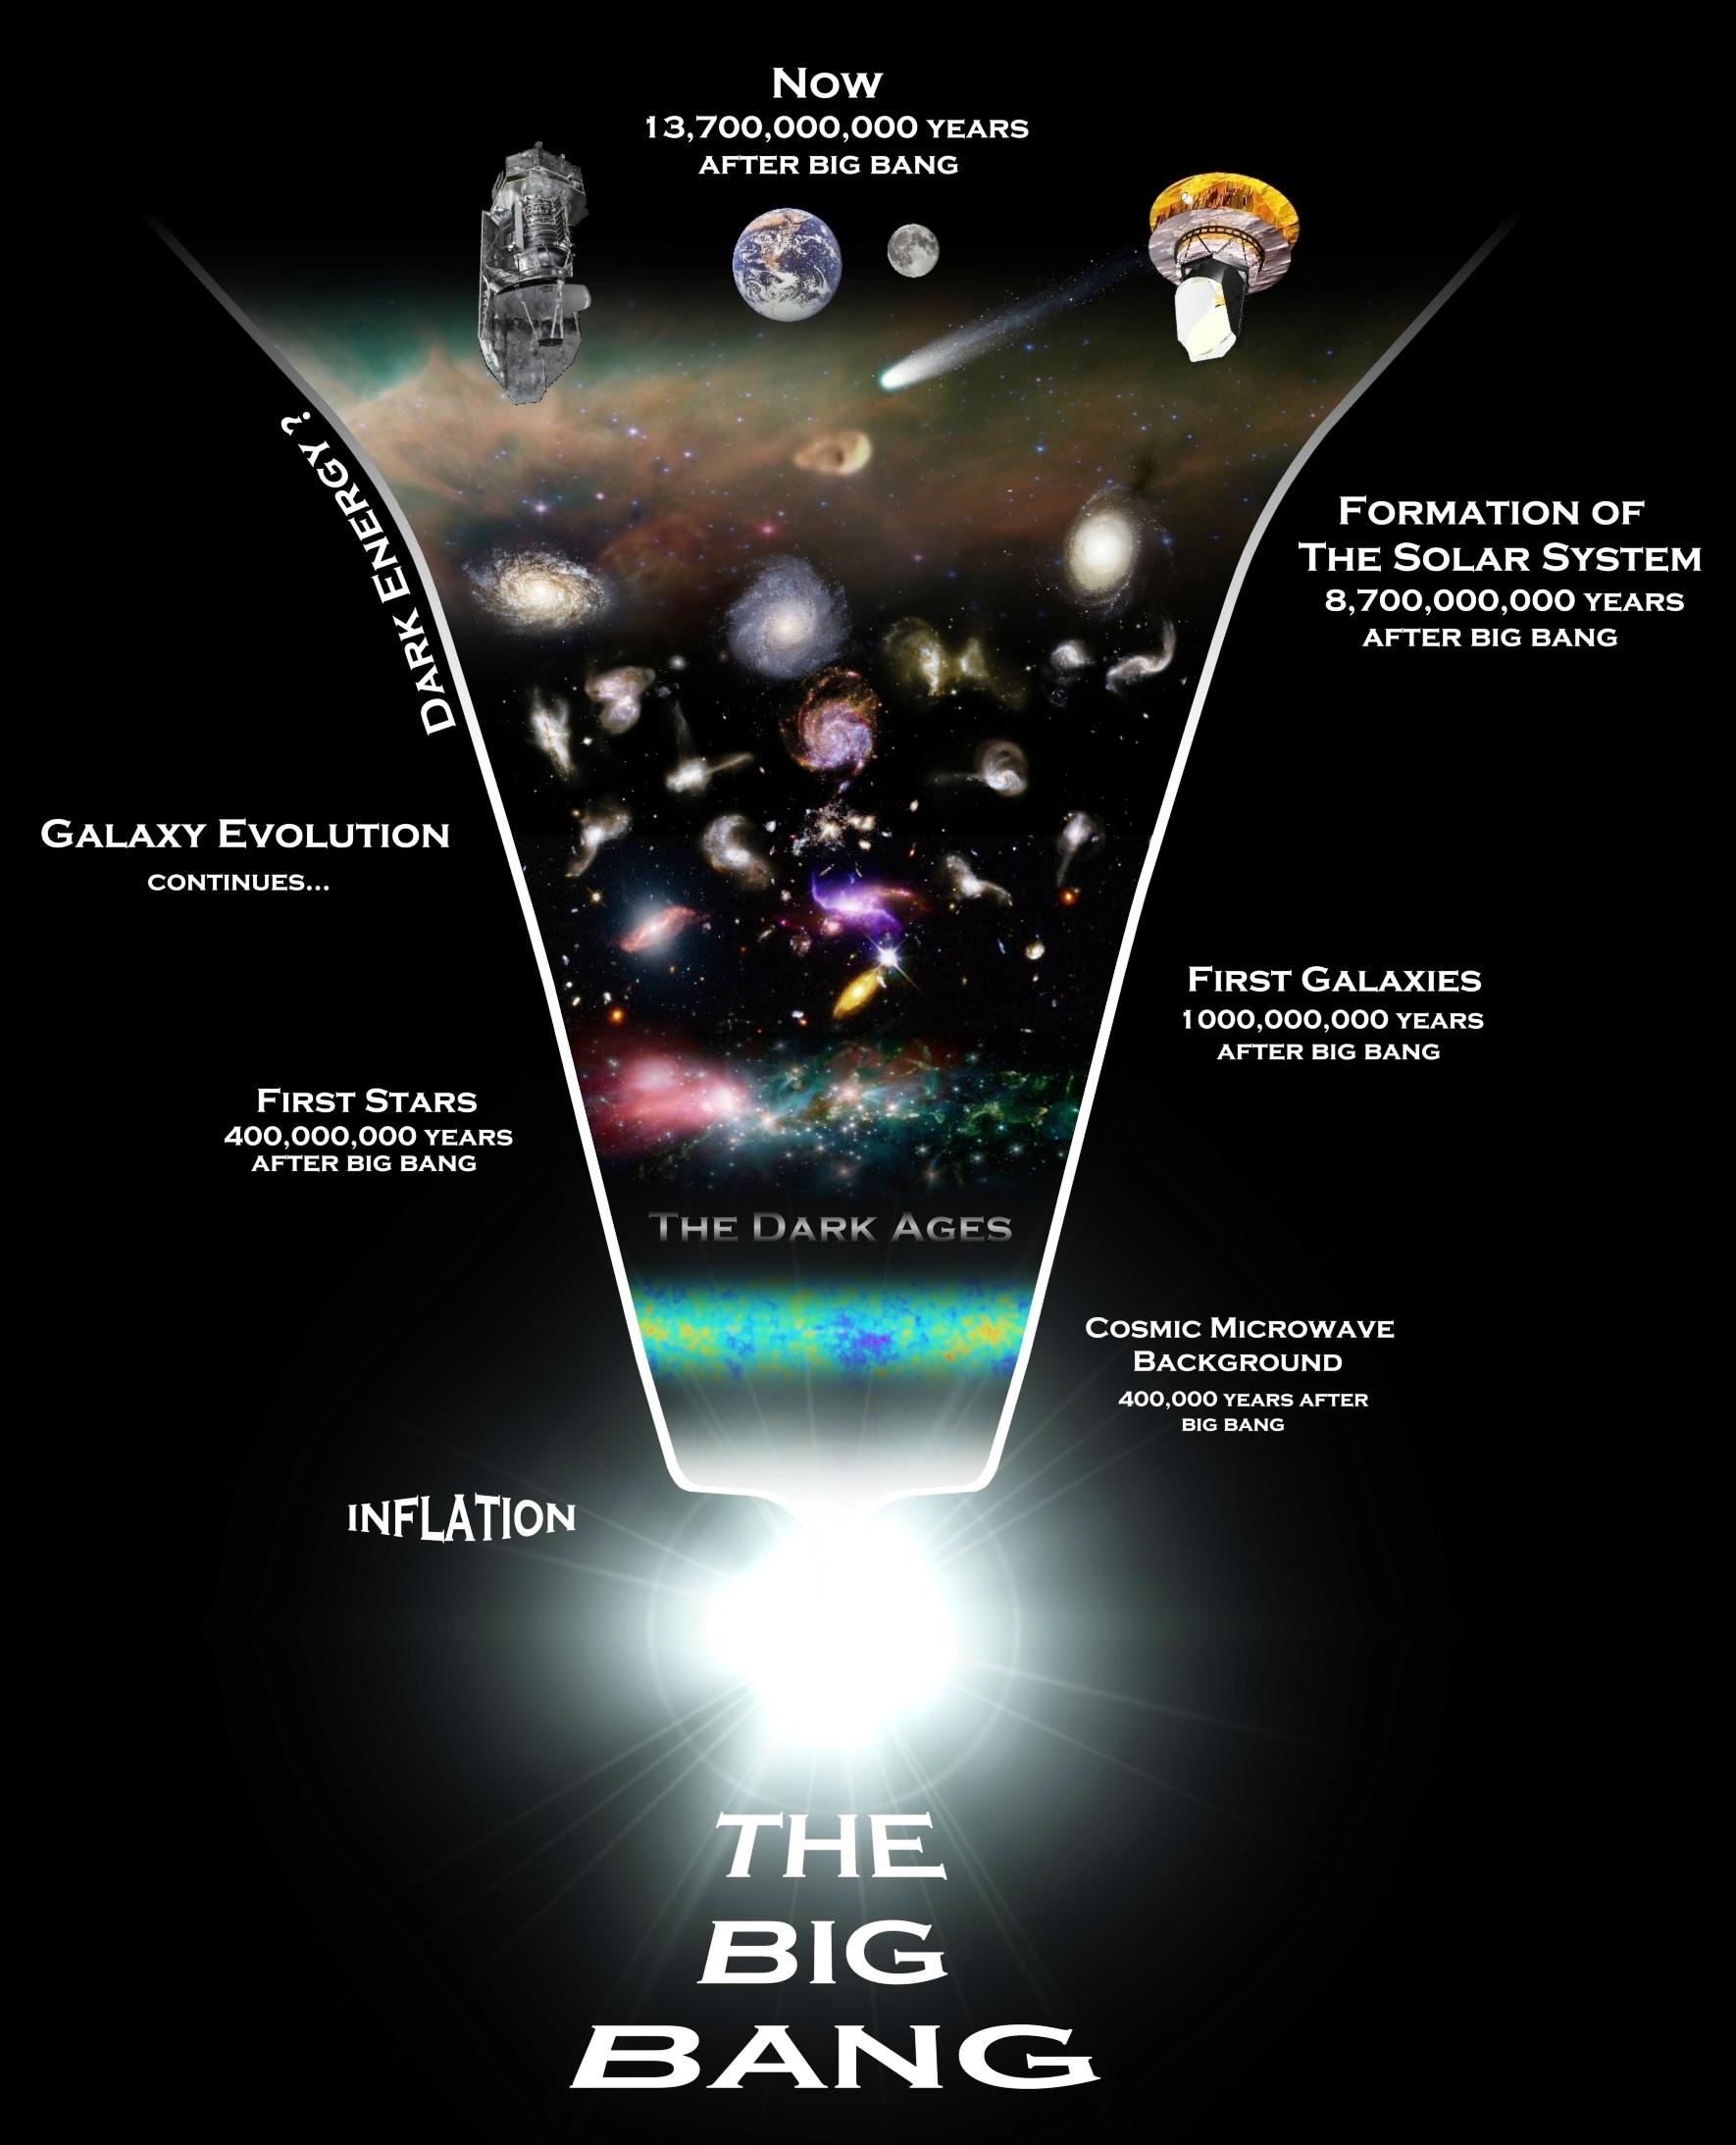 The Big Bang 187 Gci Update